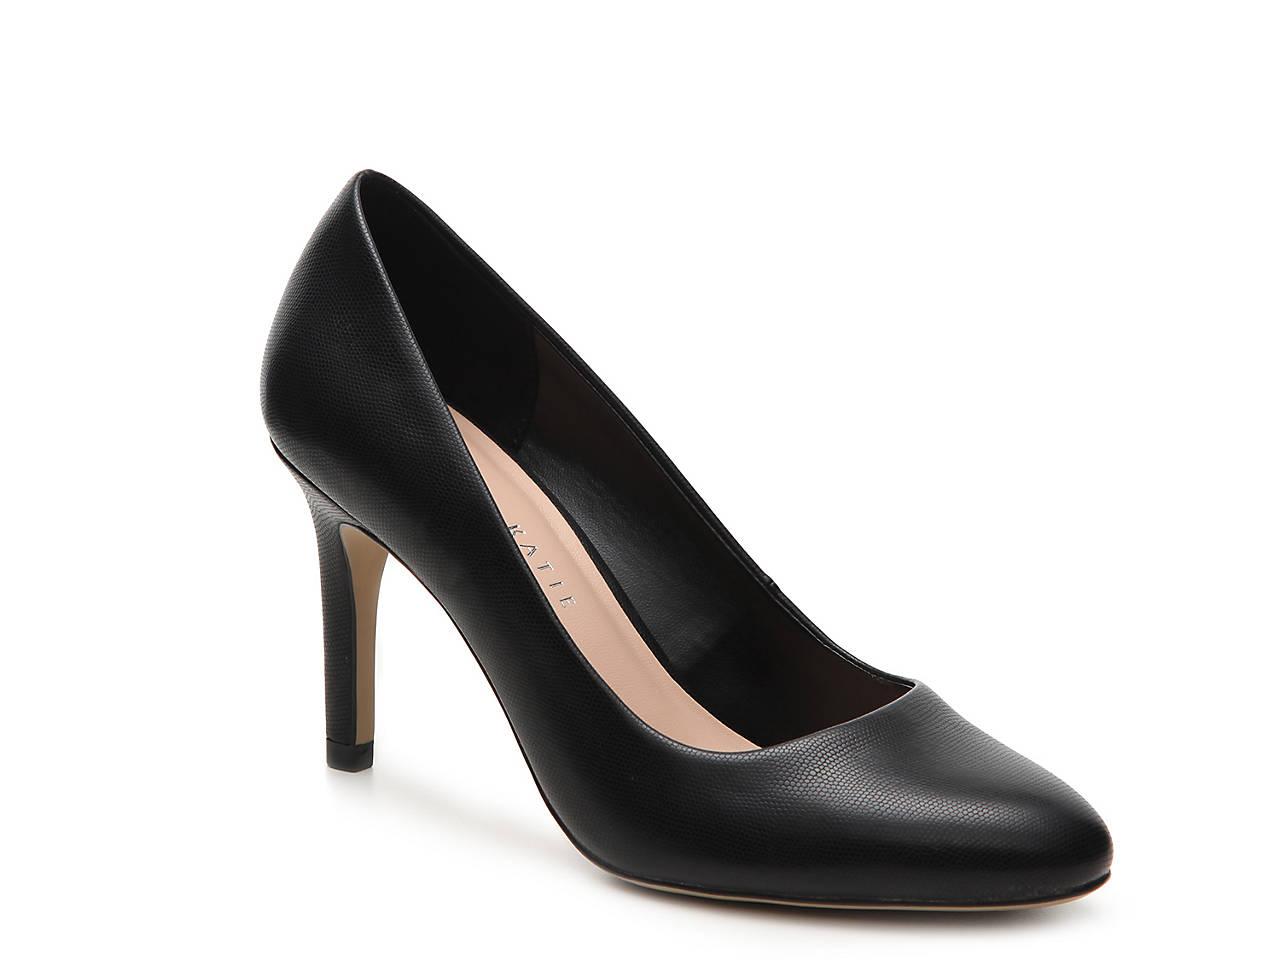 43ab0bddc Kelly & Katie Tiana Pump Women's Shoes | DSW